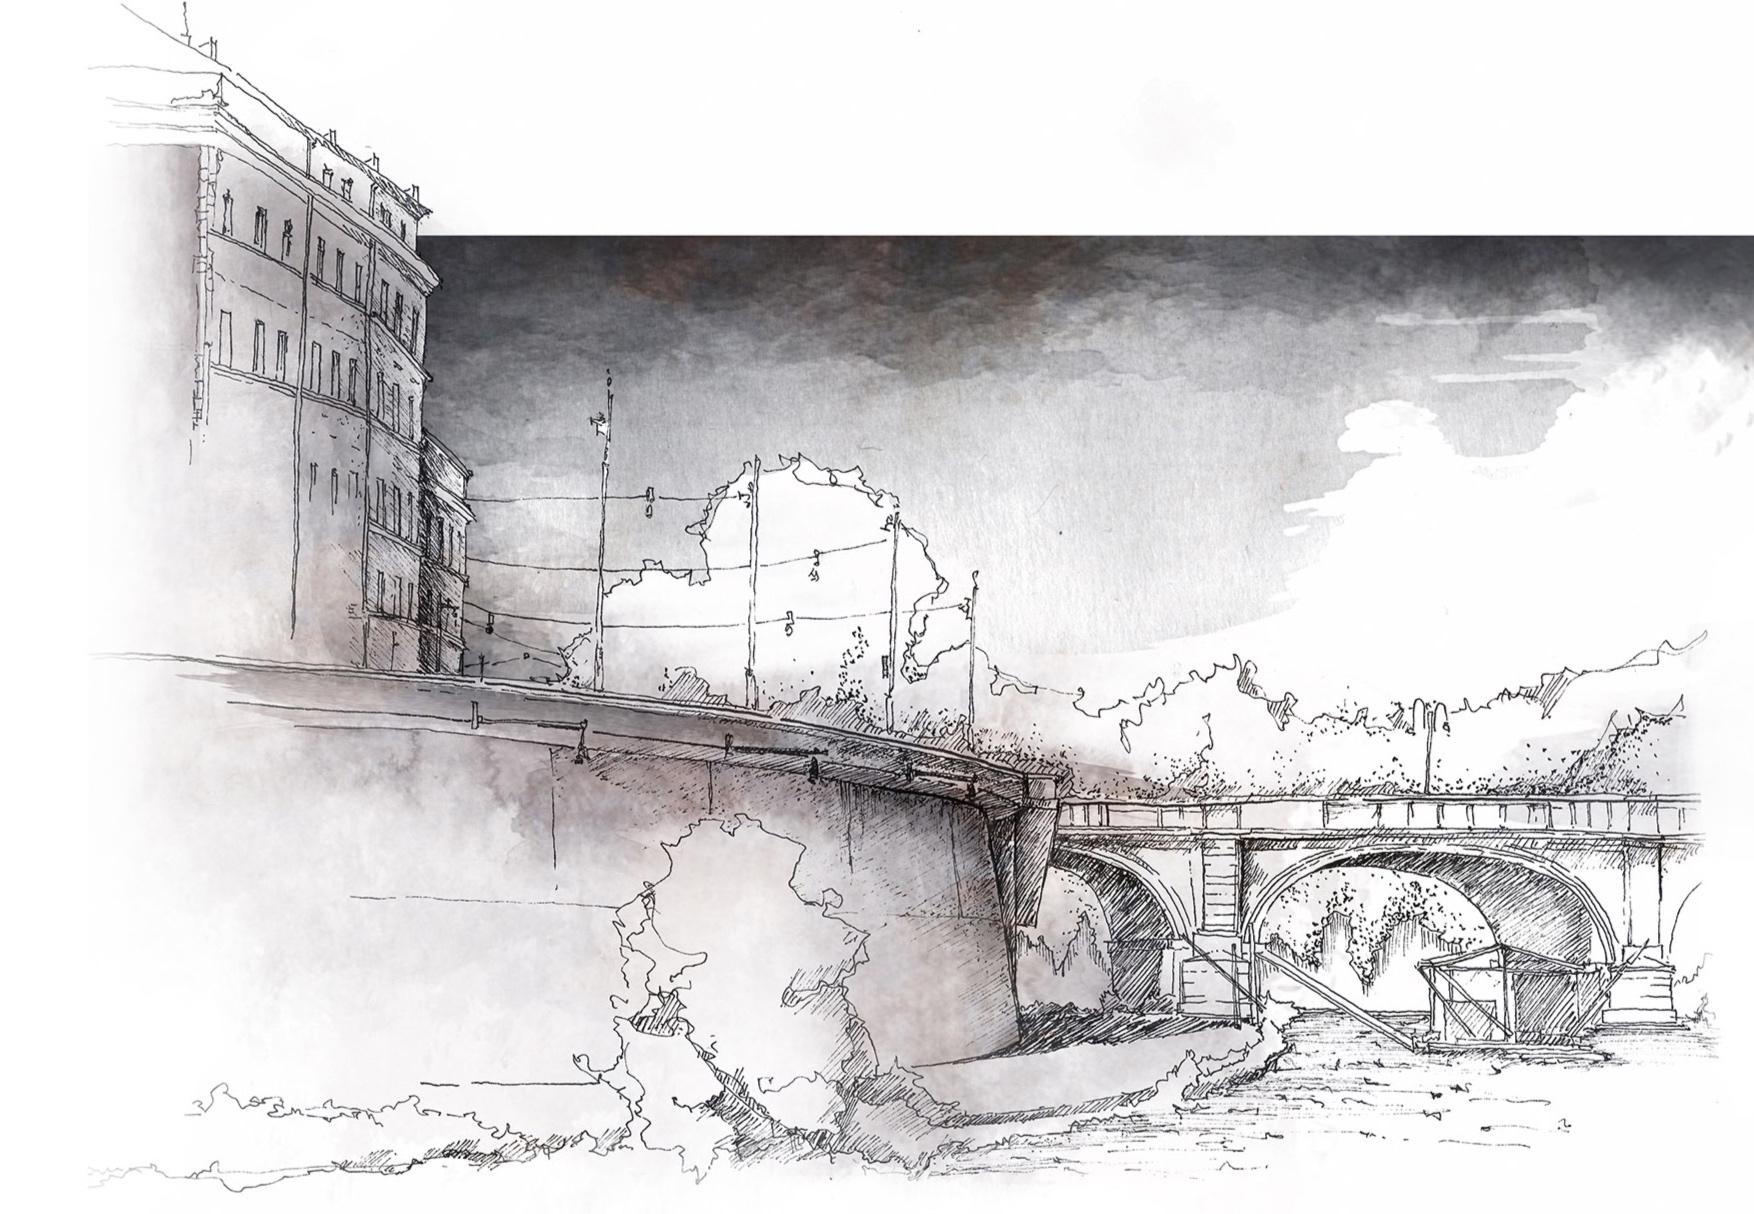 Cover_Under the Bridge_Roma_ateliercrilo.com.jpg